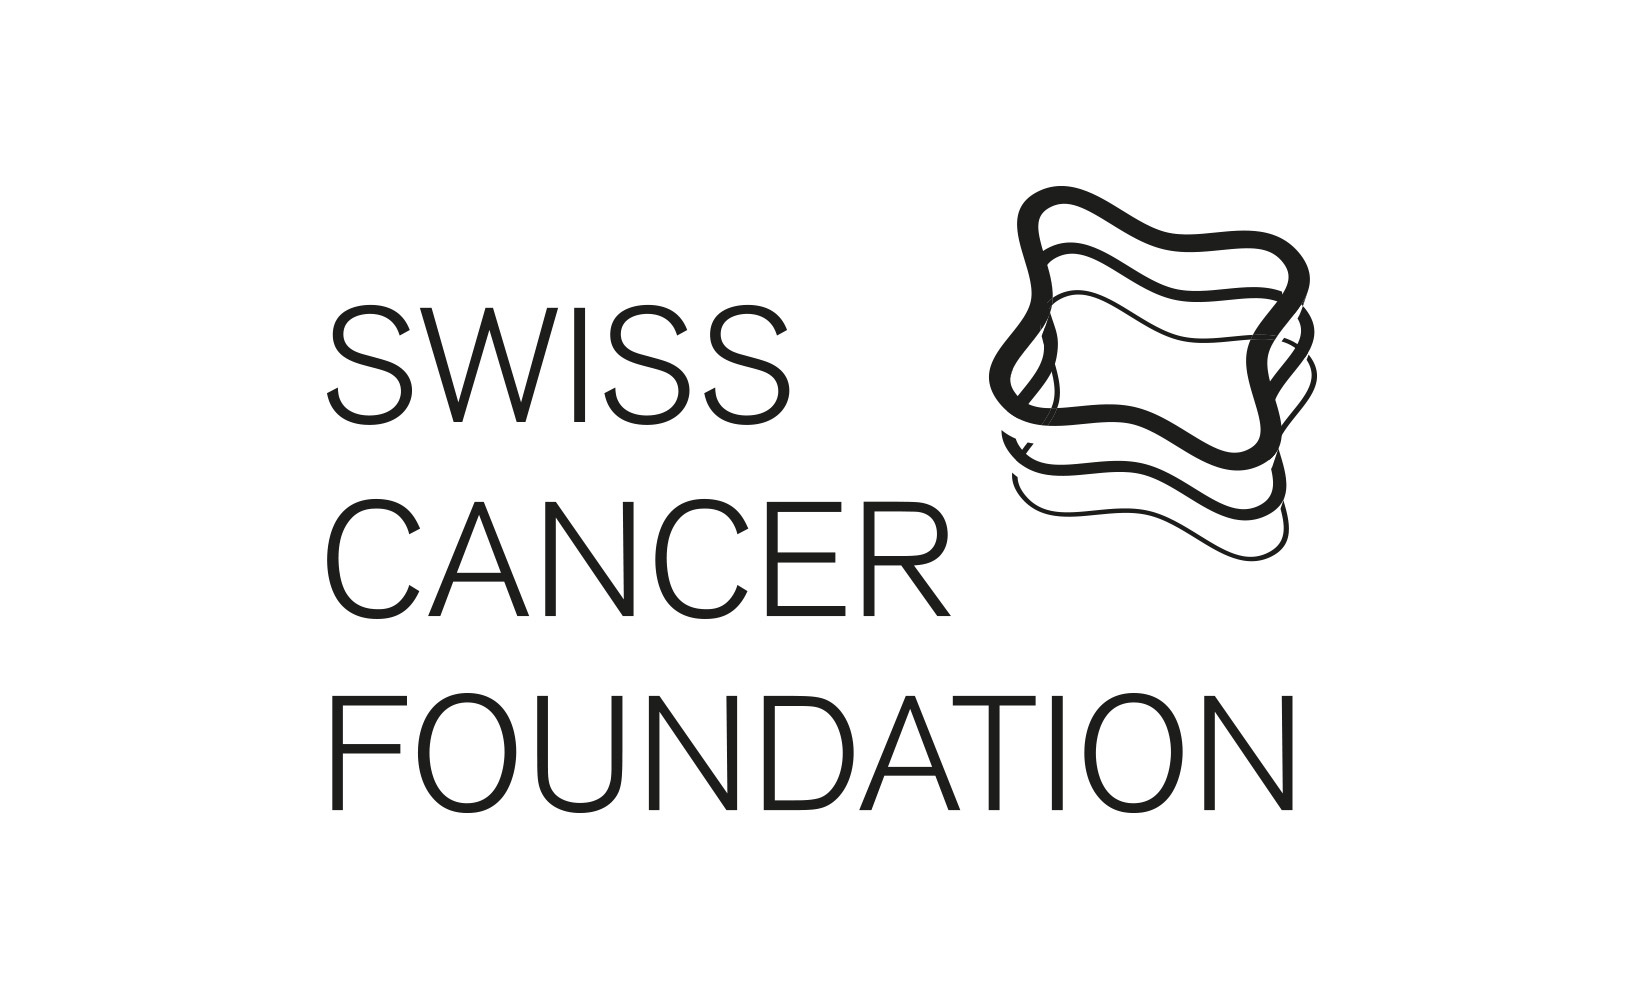 Swiss Cancer Foundation